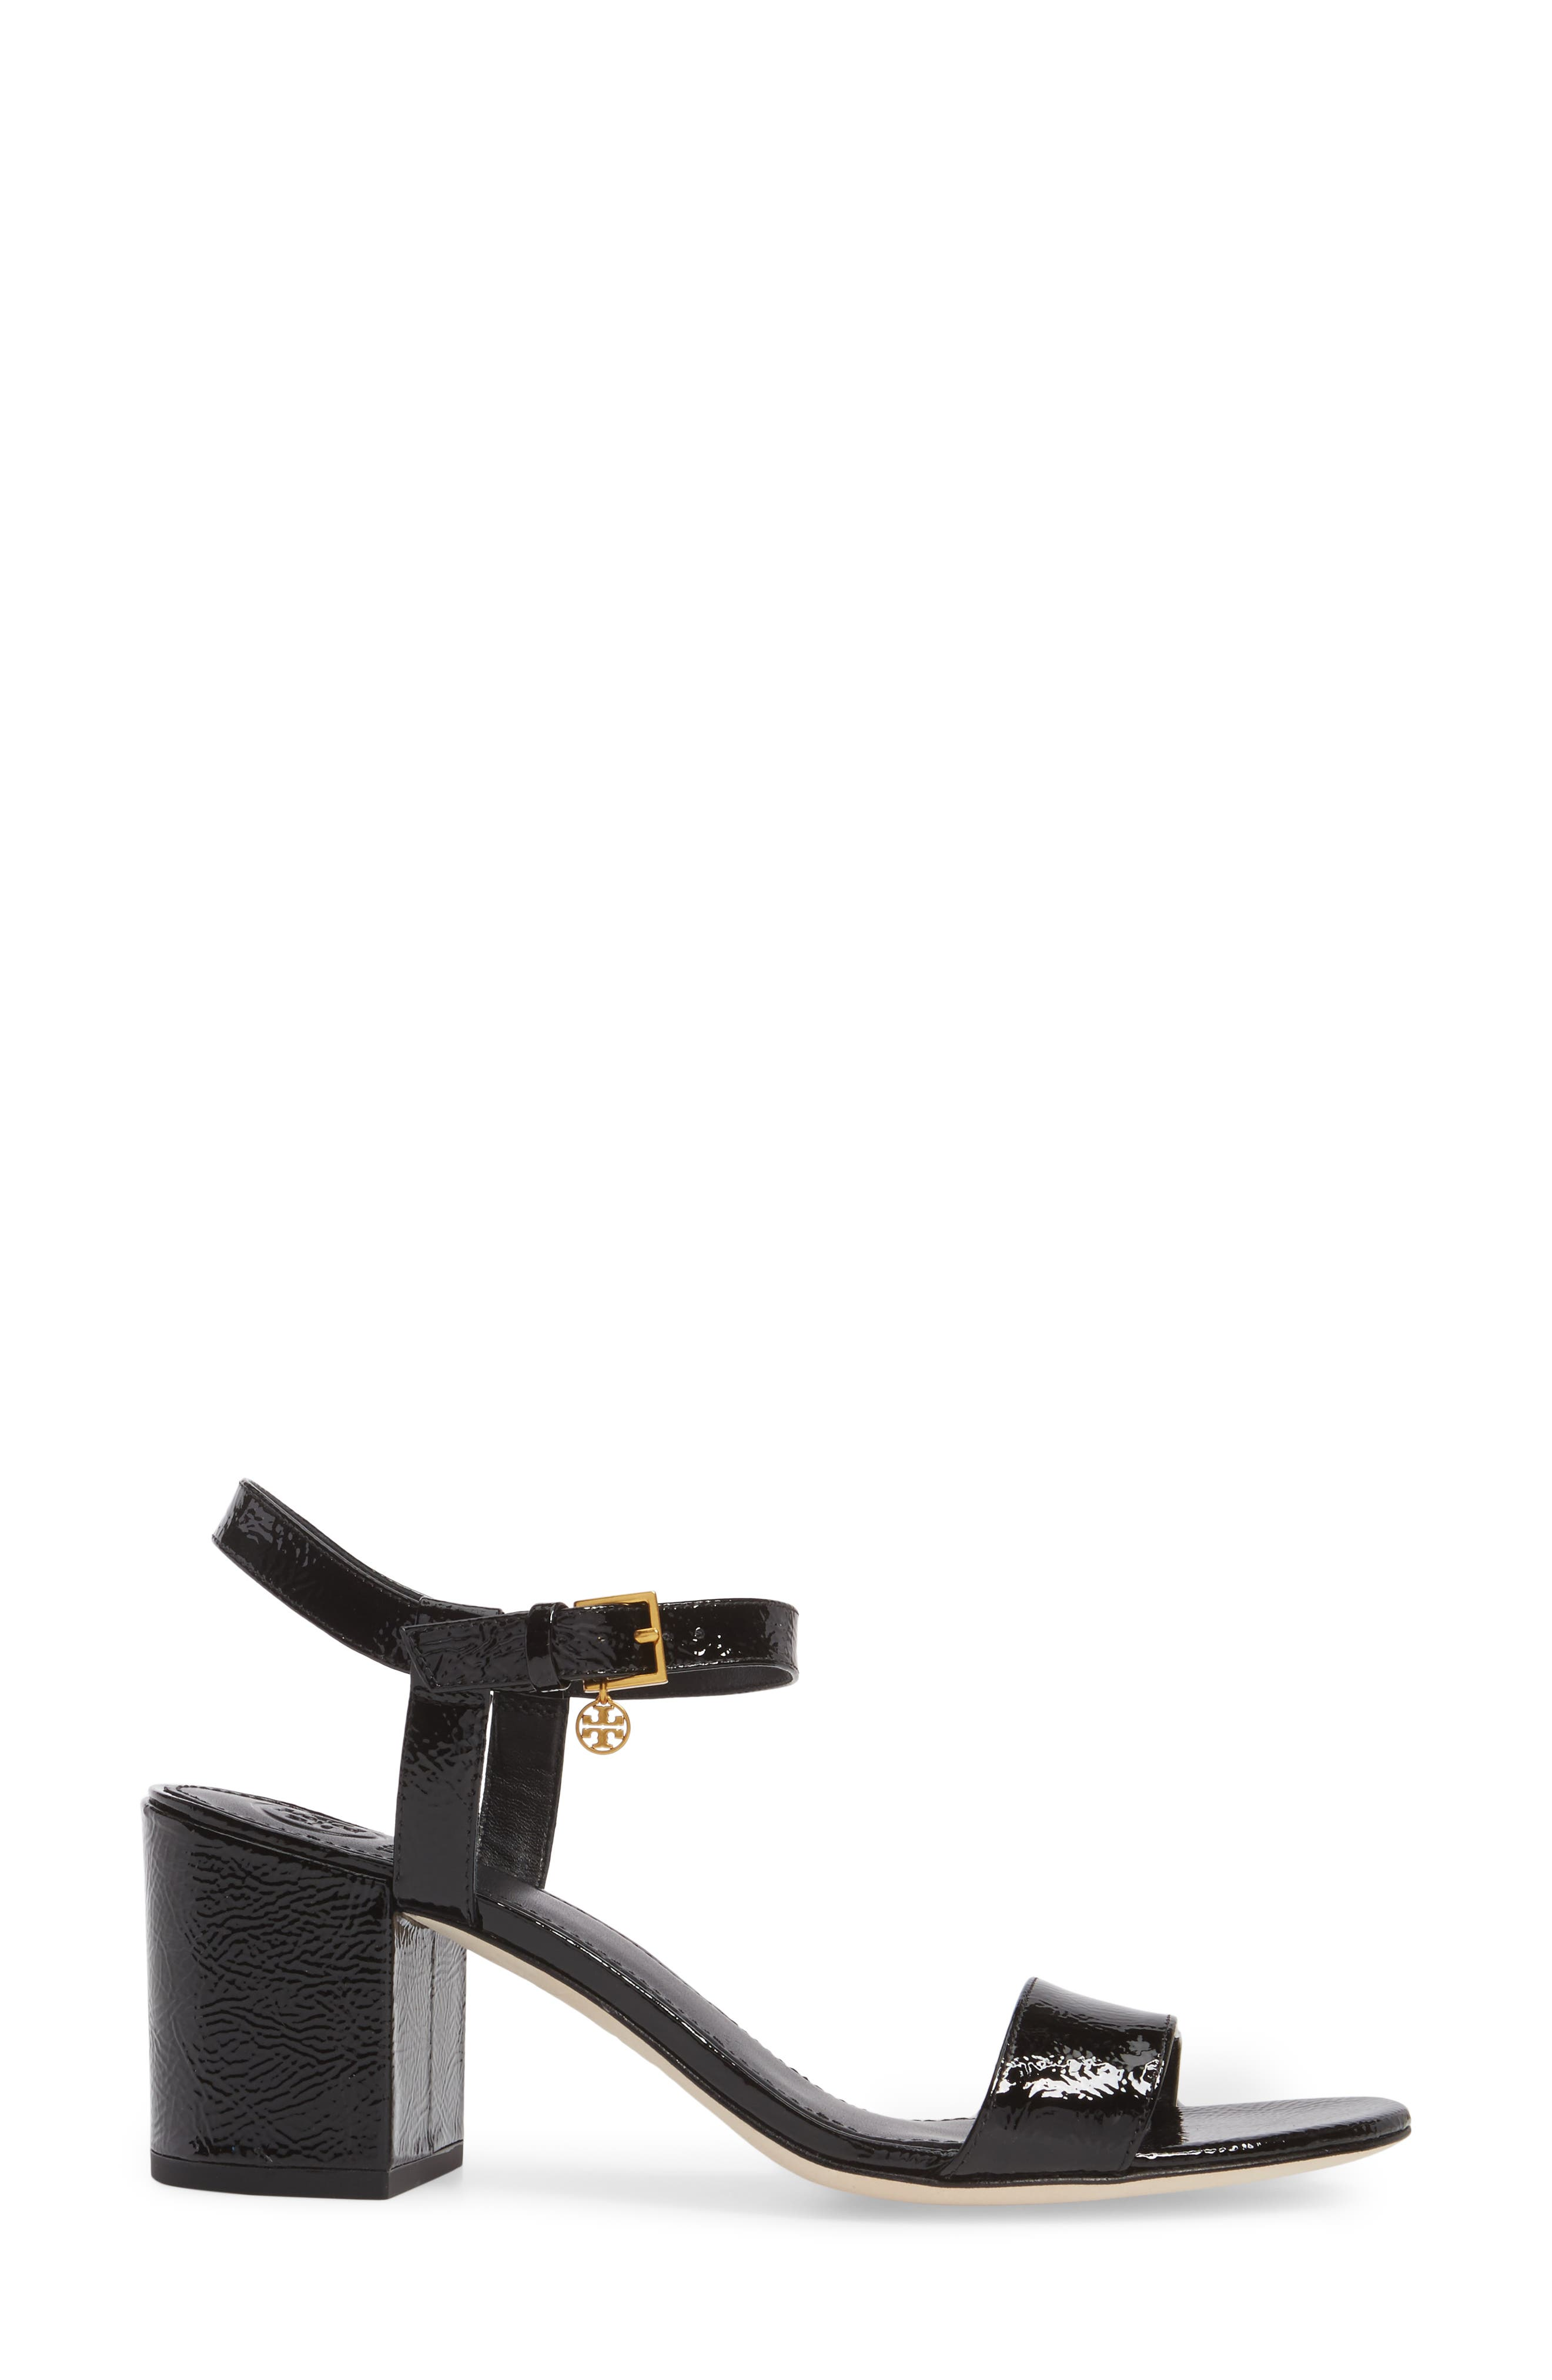 Laurel Ankle Strap Sandal,                             Alternate thumbnail 3, color,                             Black